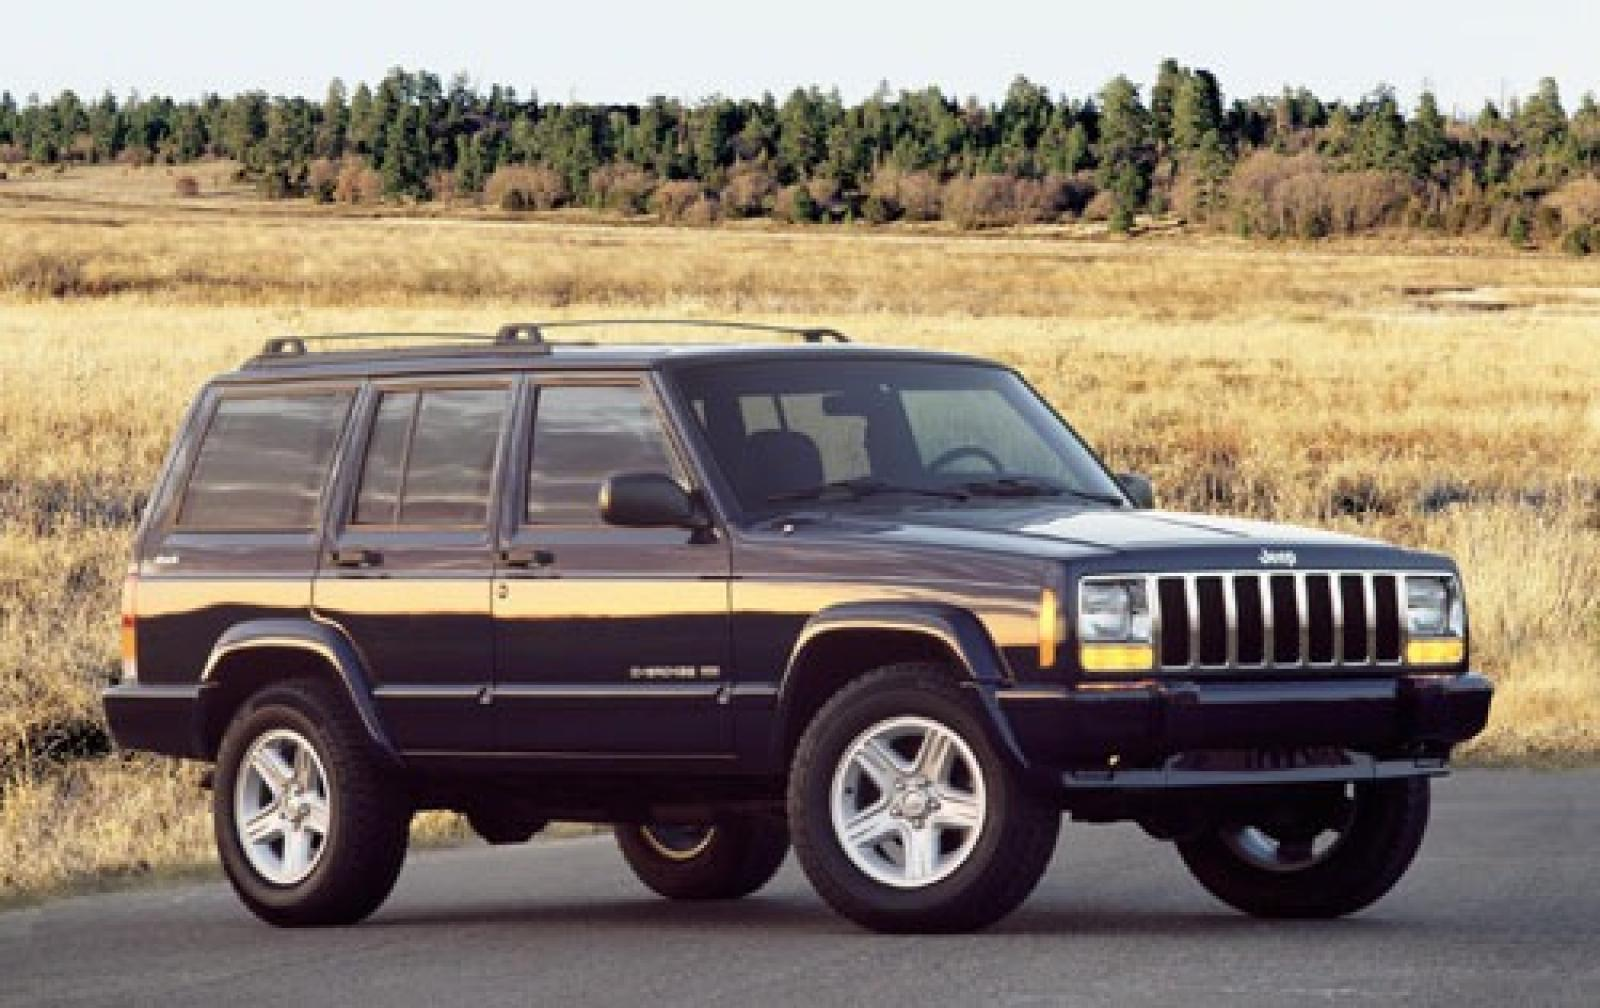 ... 2001 Jeep Cherokee Limite exterior #2 800 1024 1280 1600 origin ...